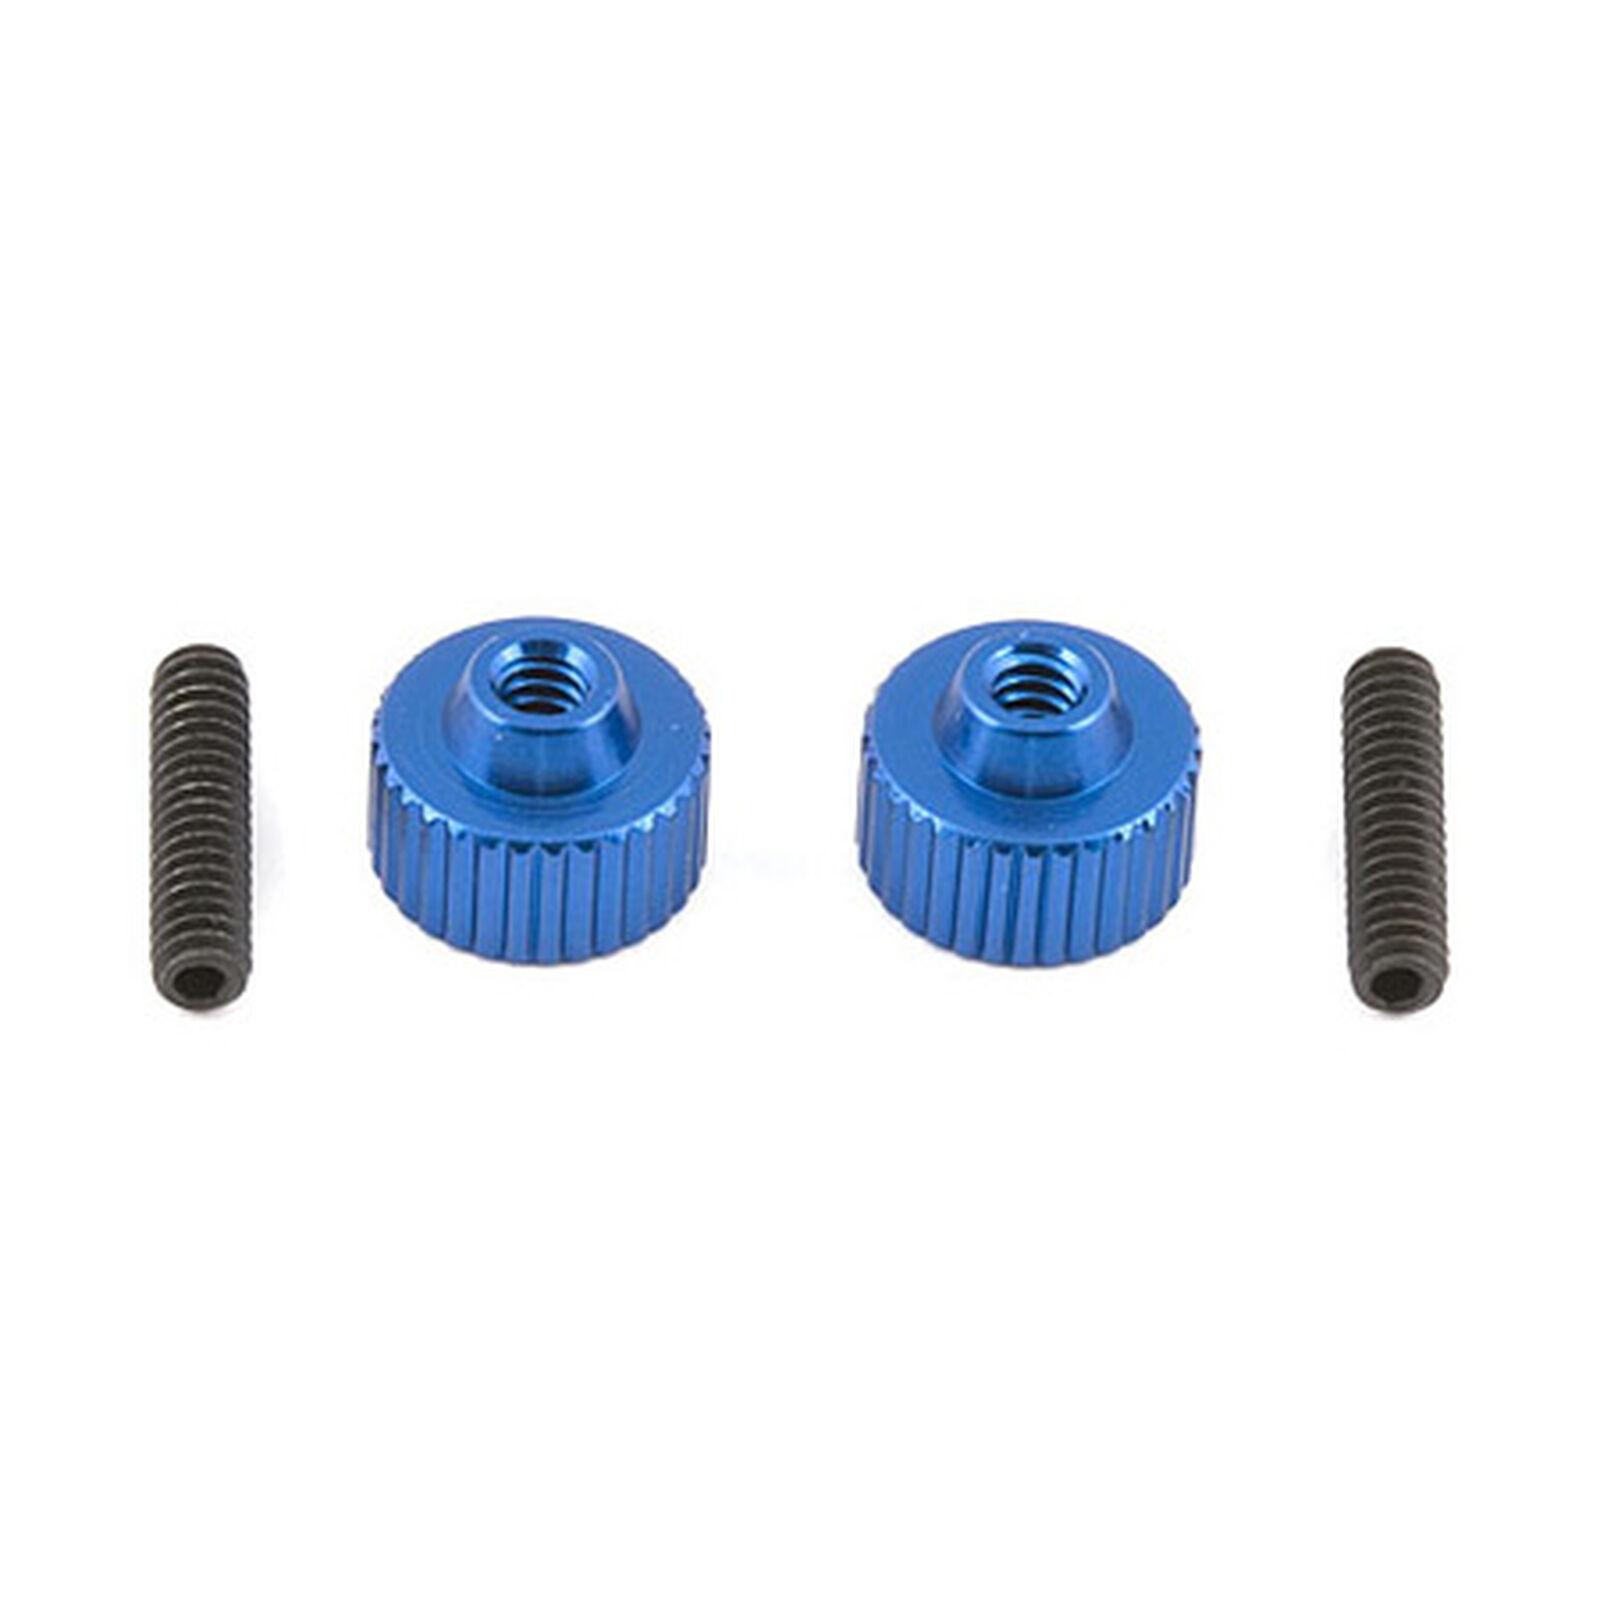 Factory Team Battery Strap Thumbscrews (2)